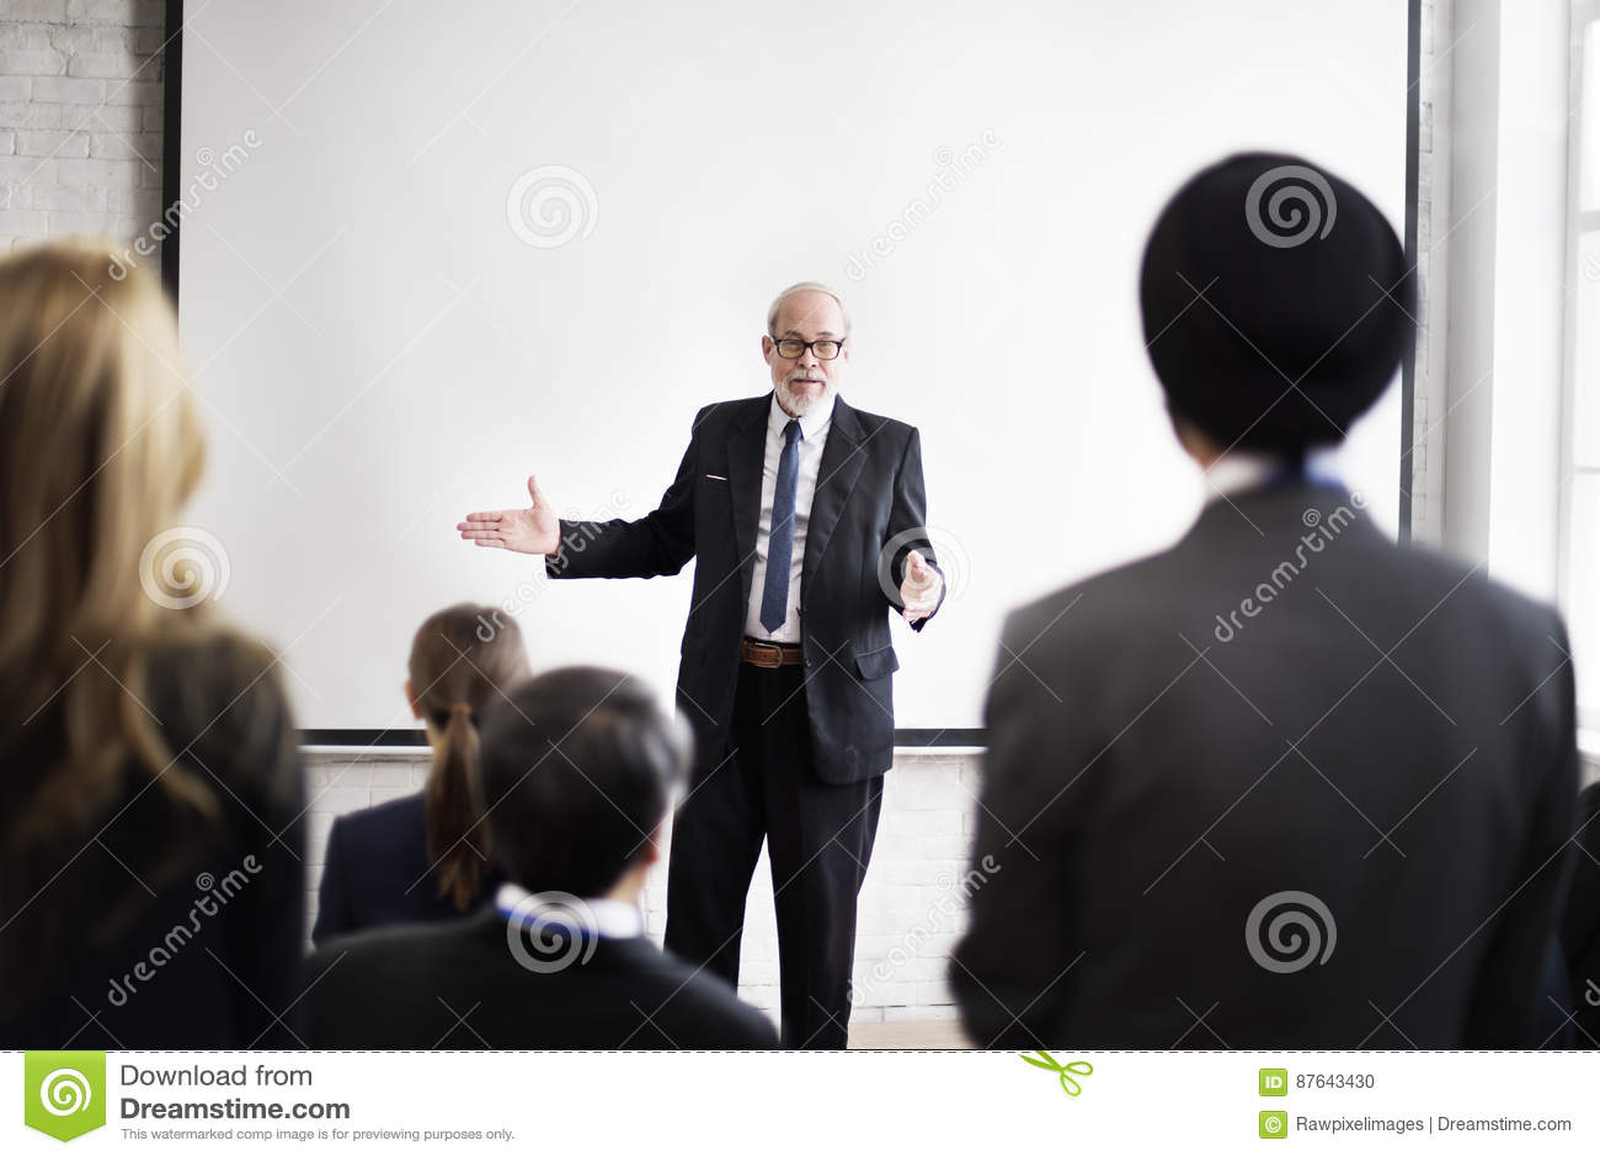 Communication Conference Meeting Presentation Seminar Concept